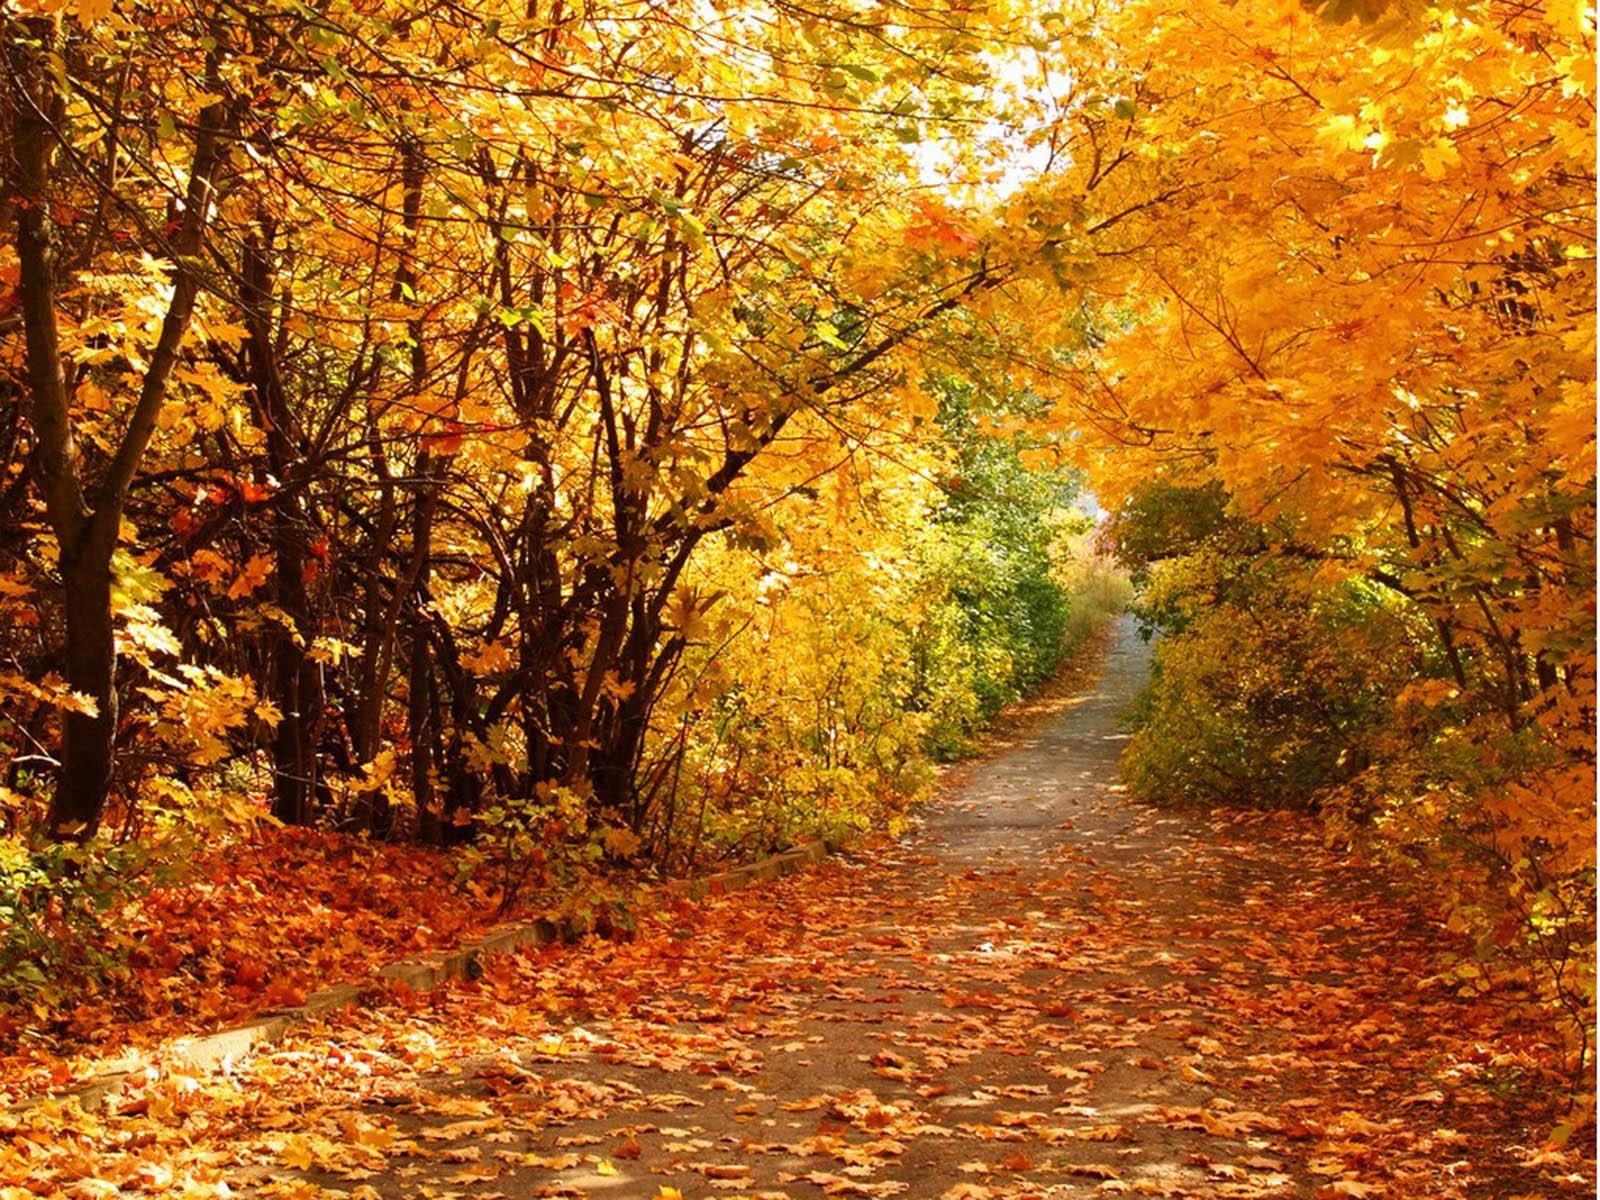 Free Download Image Beautiful Autumn Scenery